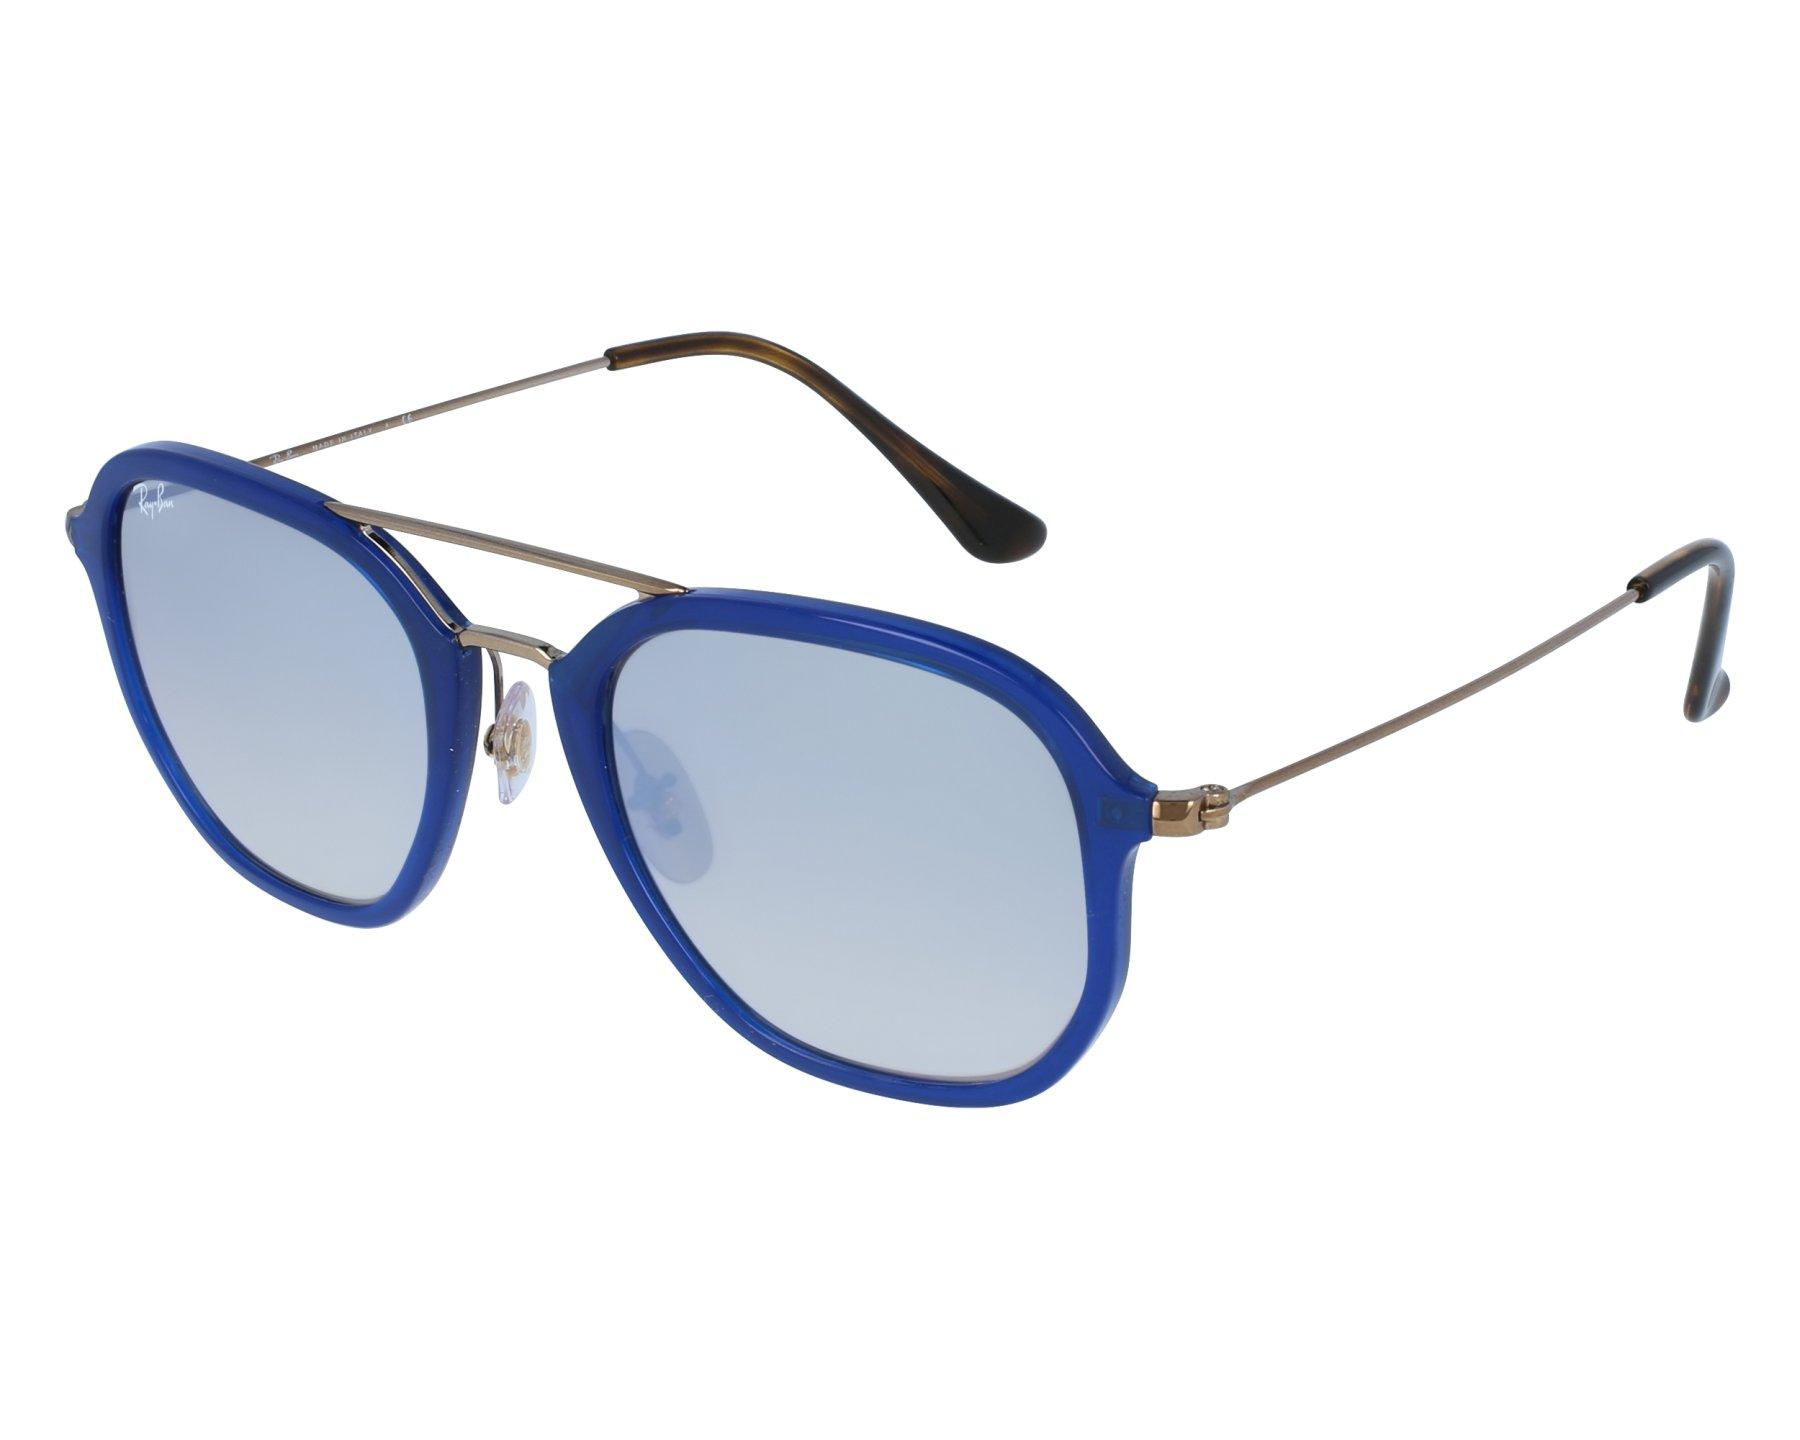 Ray-Ban New Wayfarer Rb 2132 unisex Sunglasses online sale